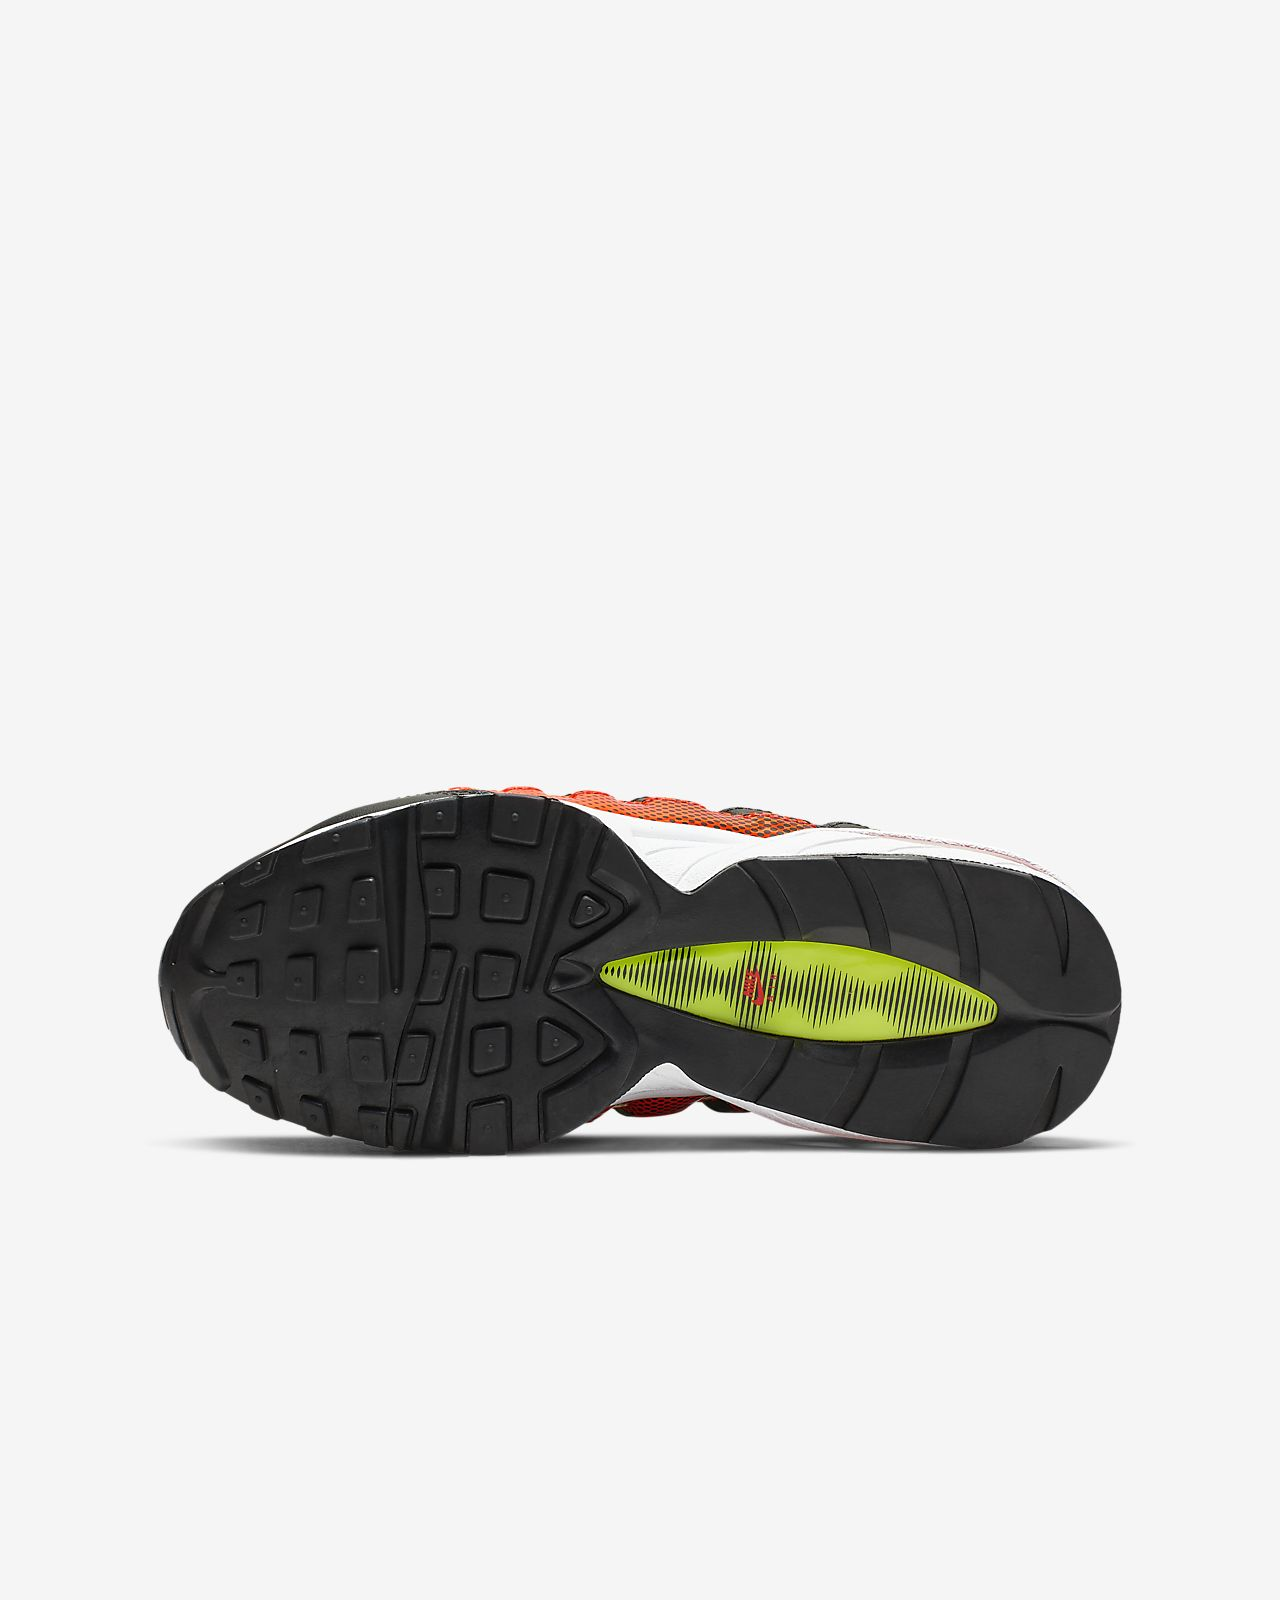 online retailer 8489e dabbb ... Nike Air Max 95 Big Kids  Shoe